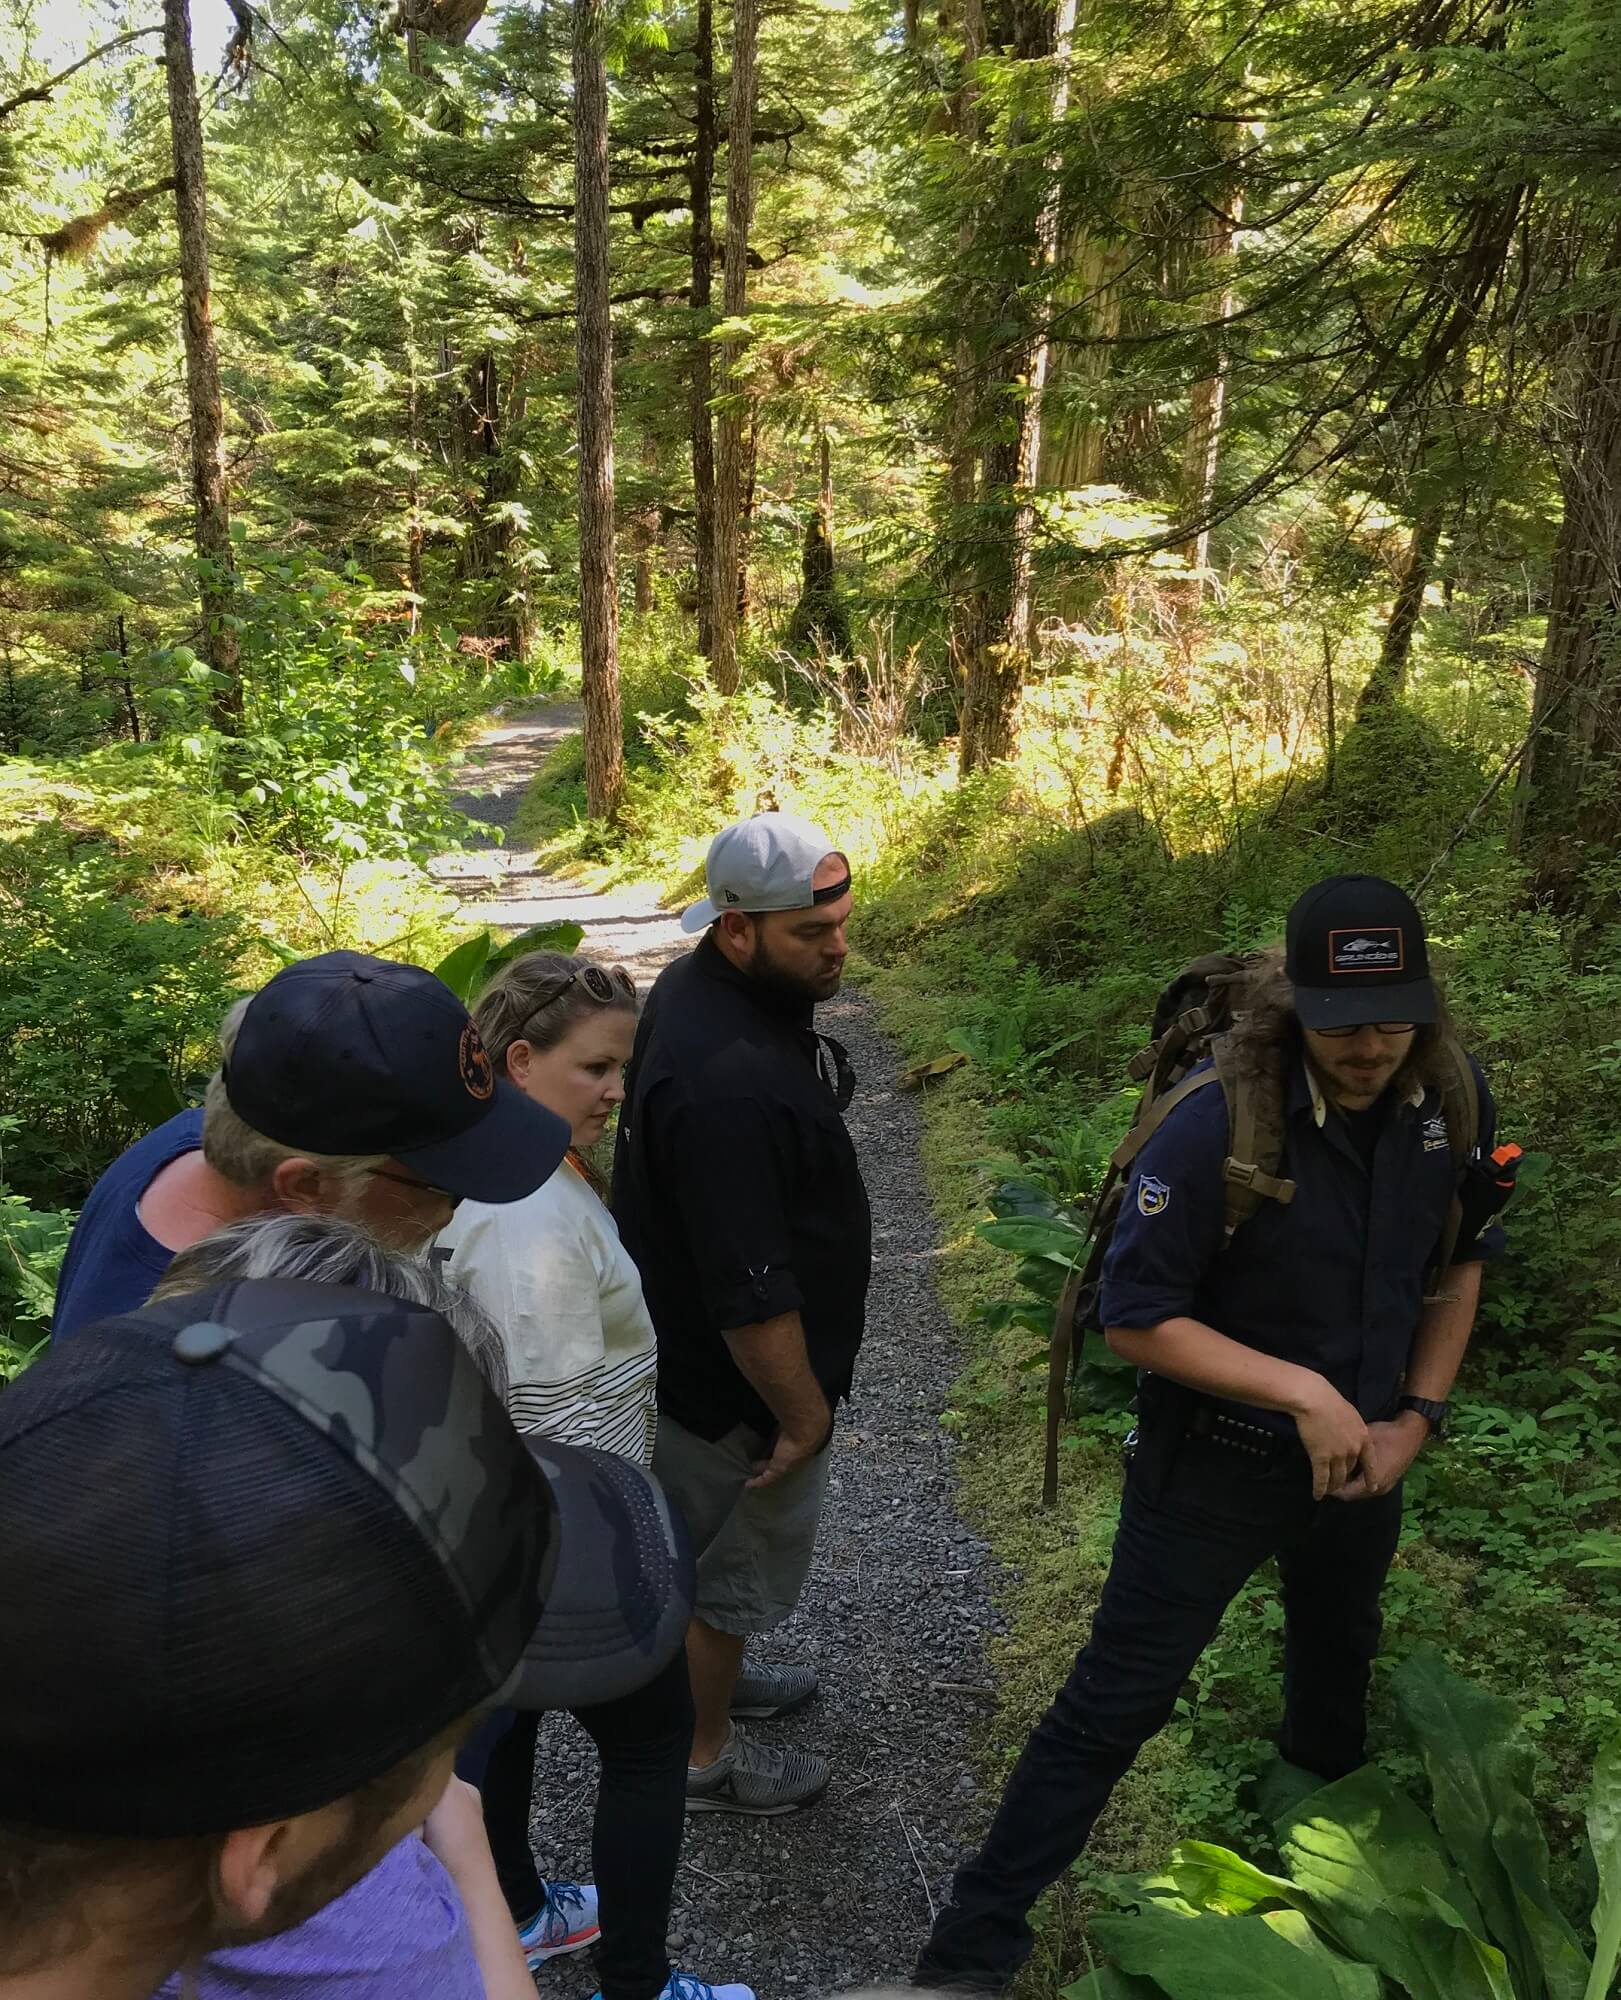 https://secureservercdn.net/72.167.241.180/c2p.415.myftpupload.com/wp-content/uploads/2018/10/Alaska-Bear-Trail-with-guide.jpeg?time=1634200883